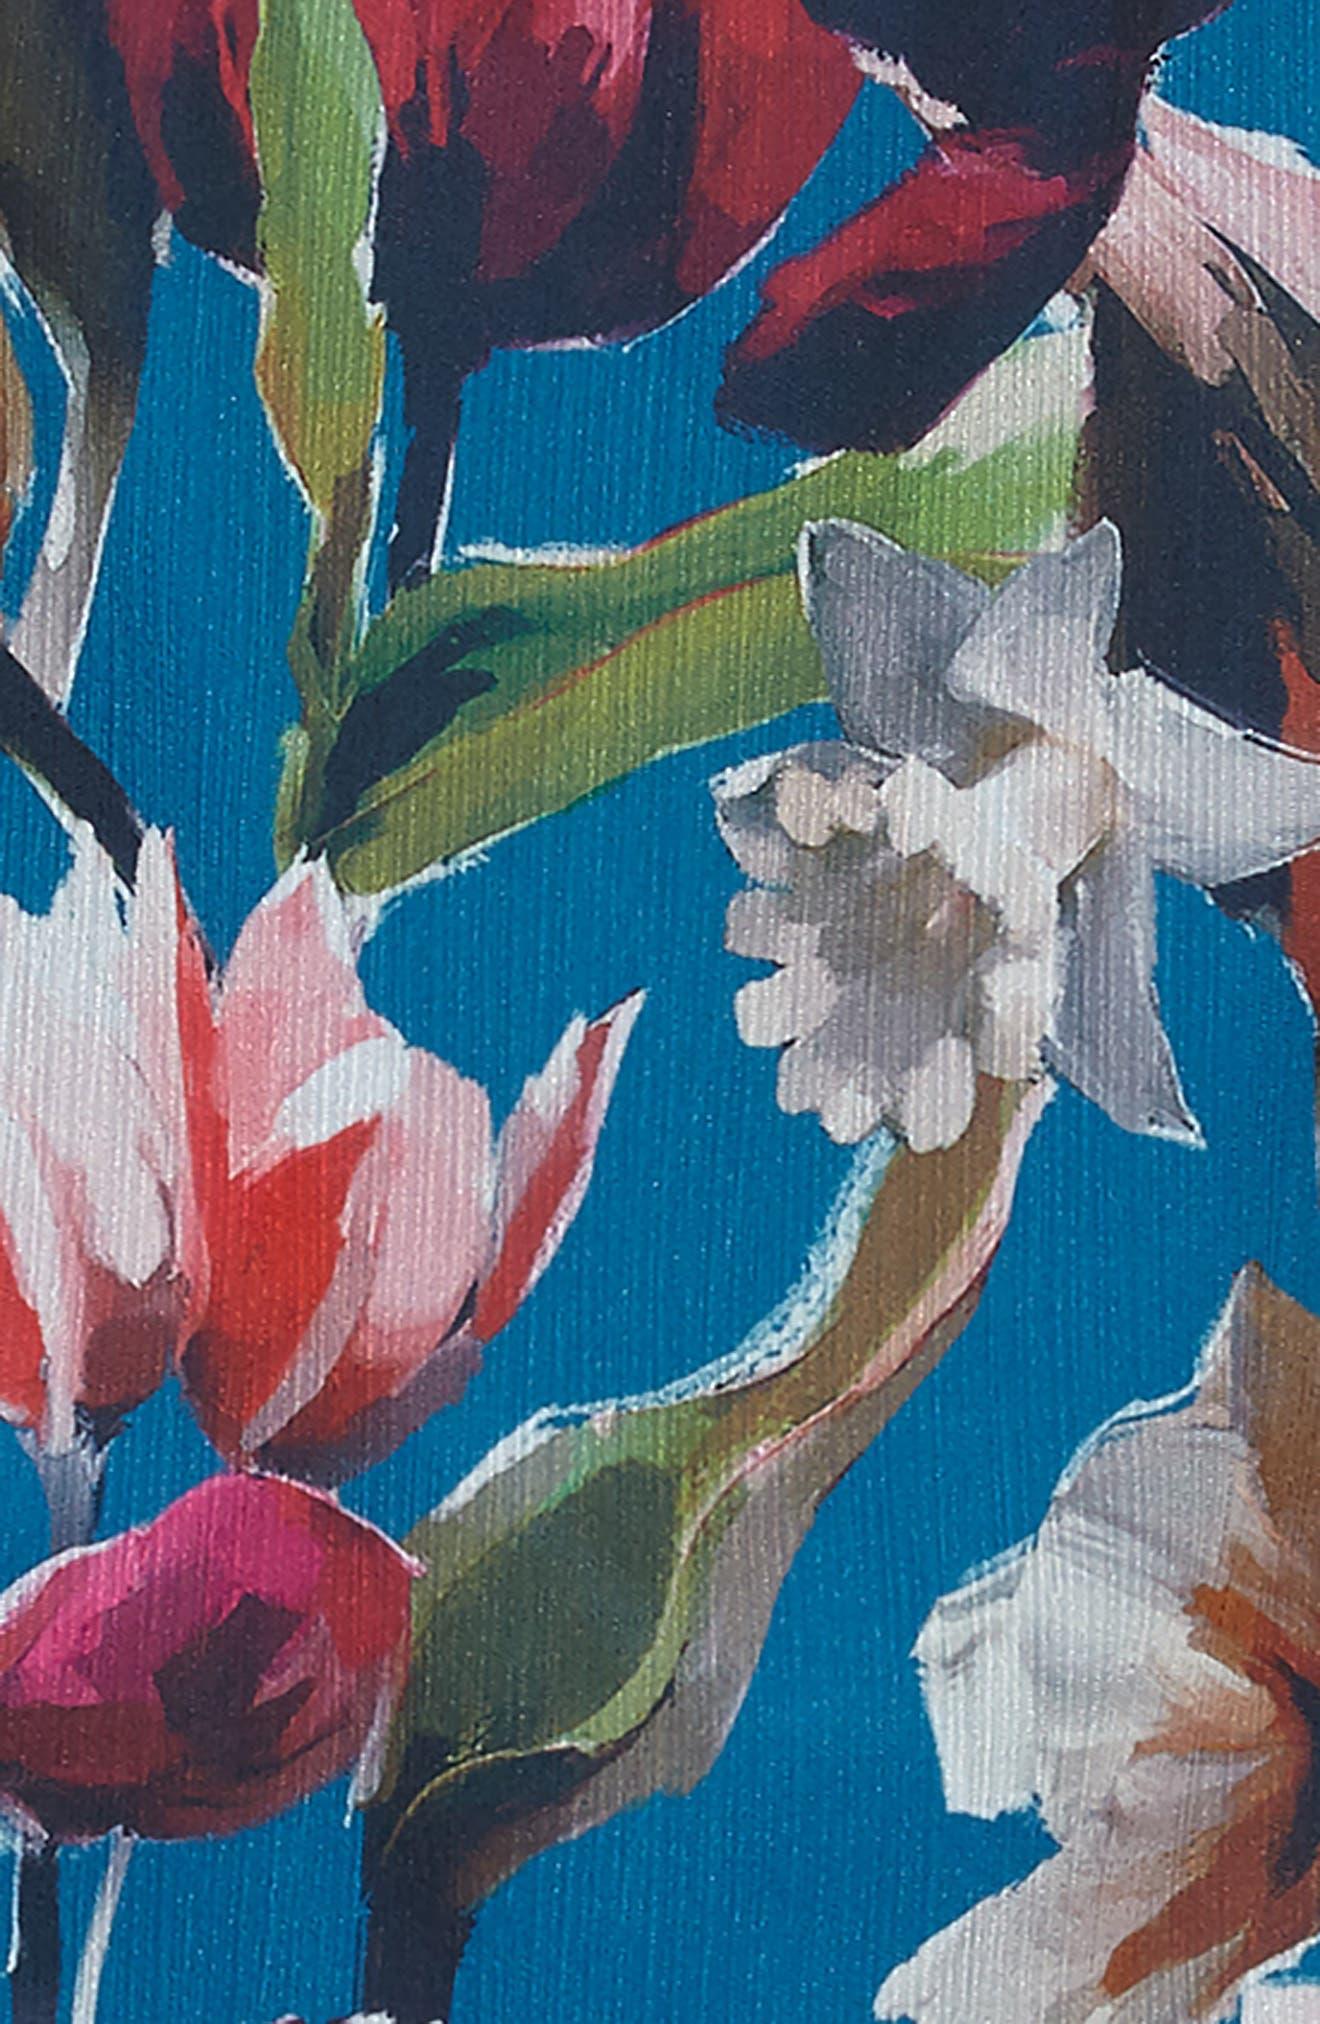 Josephine Two-Piece Ruffle Dress,                             Alternate thumbnail 3, color,                             400